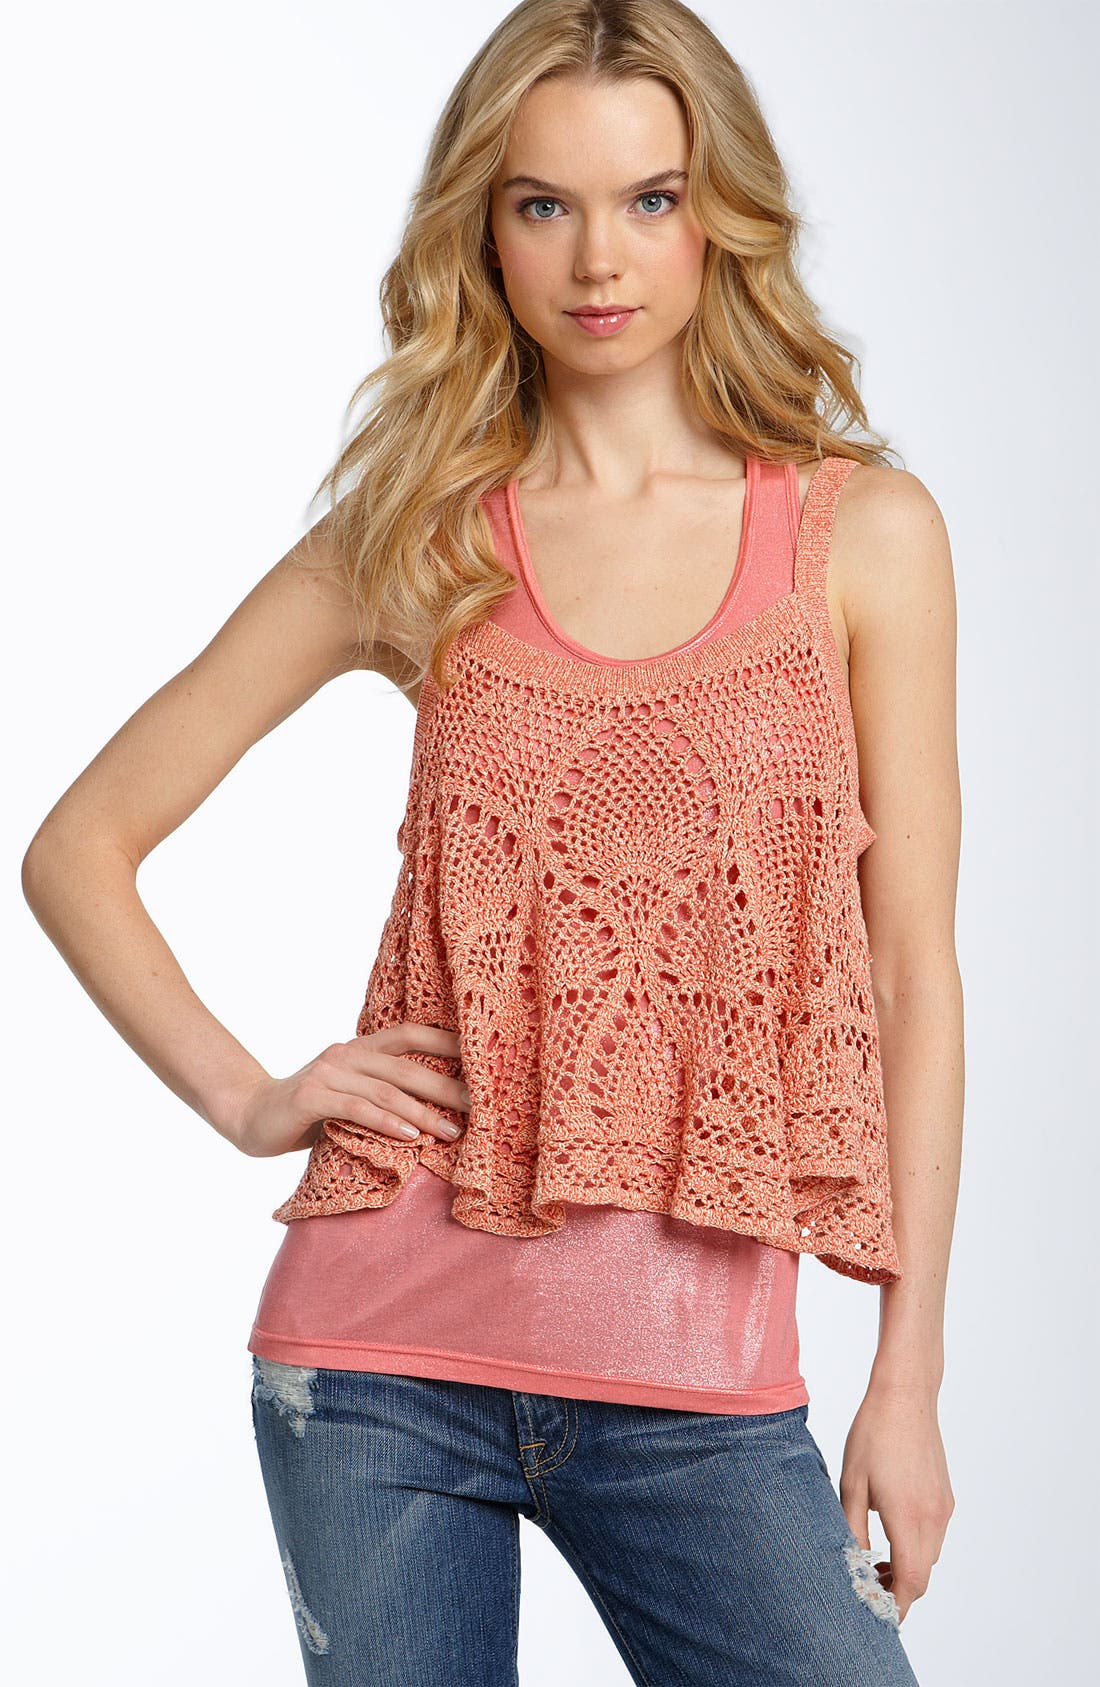 Main Image - Free People 'Carefree' Crochet Camisole